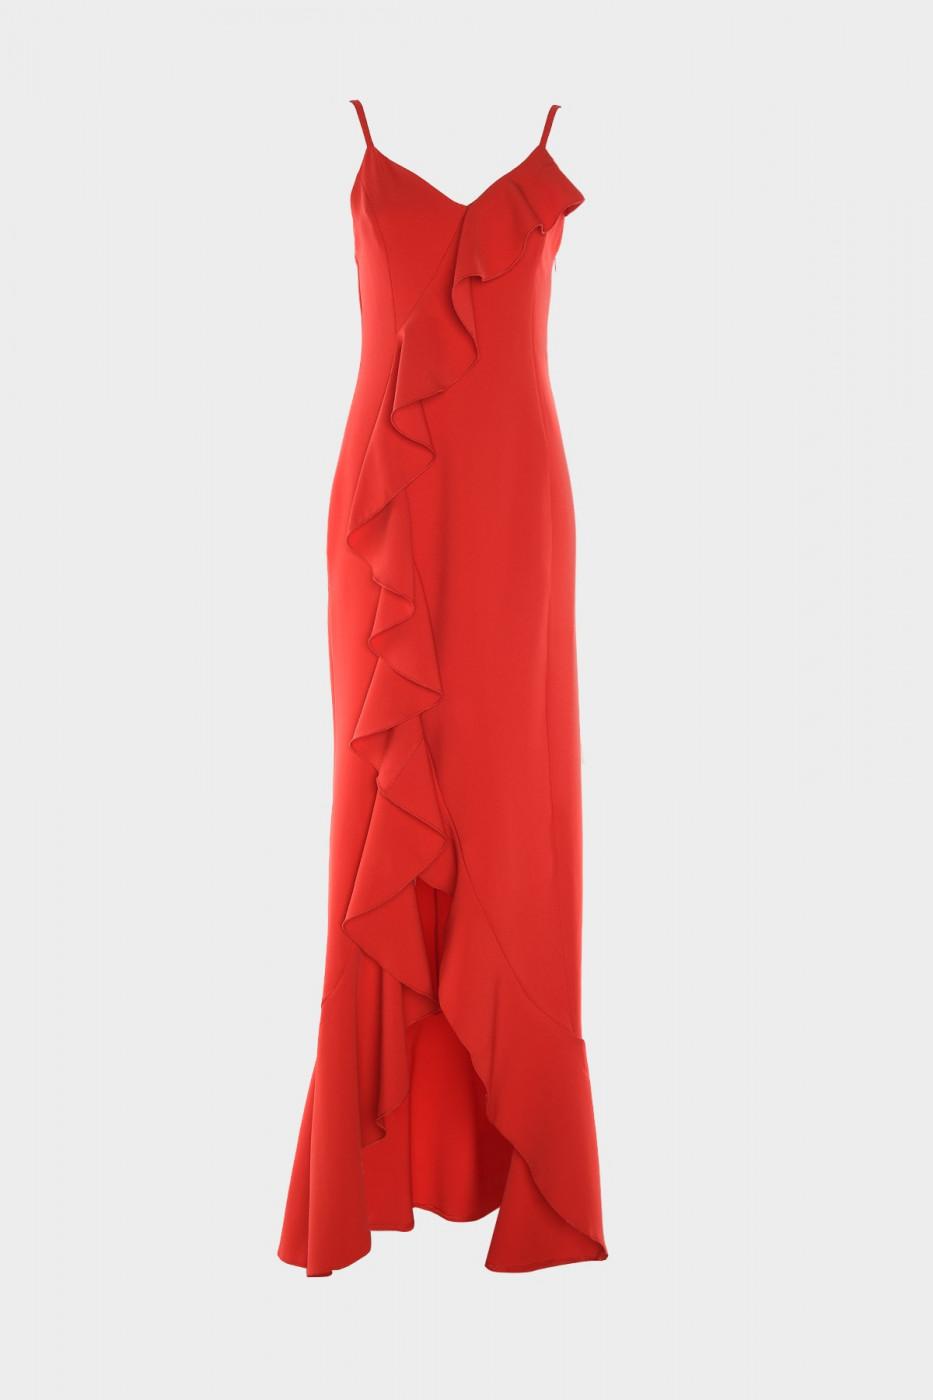 Trendyol Red Frill Detailed Evening Dress & Graduation Dress